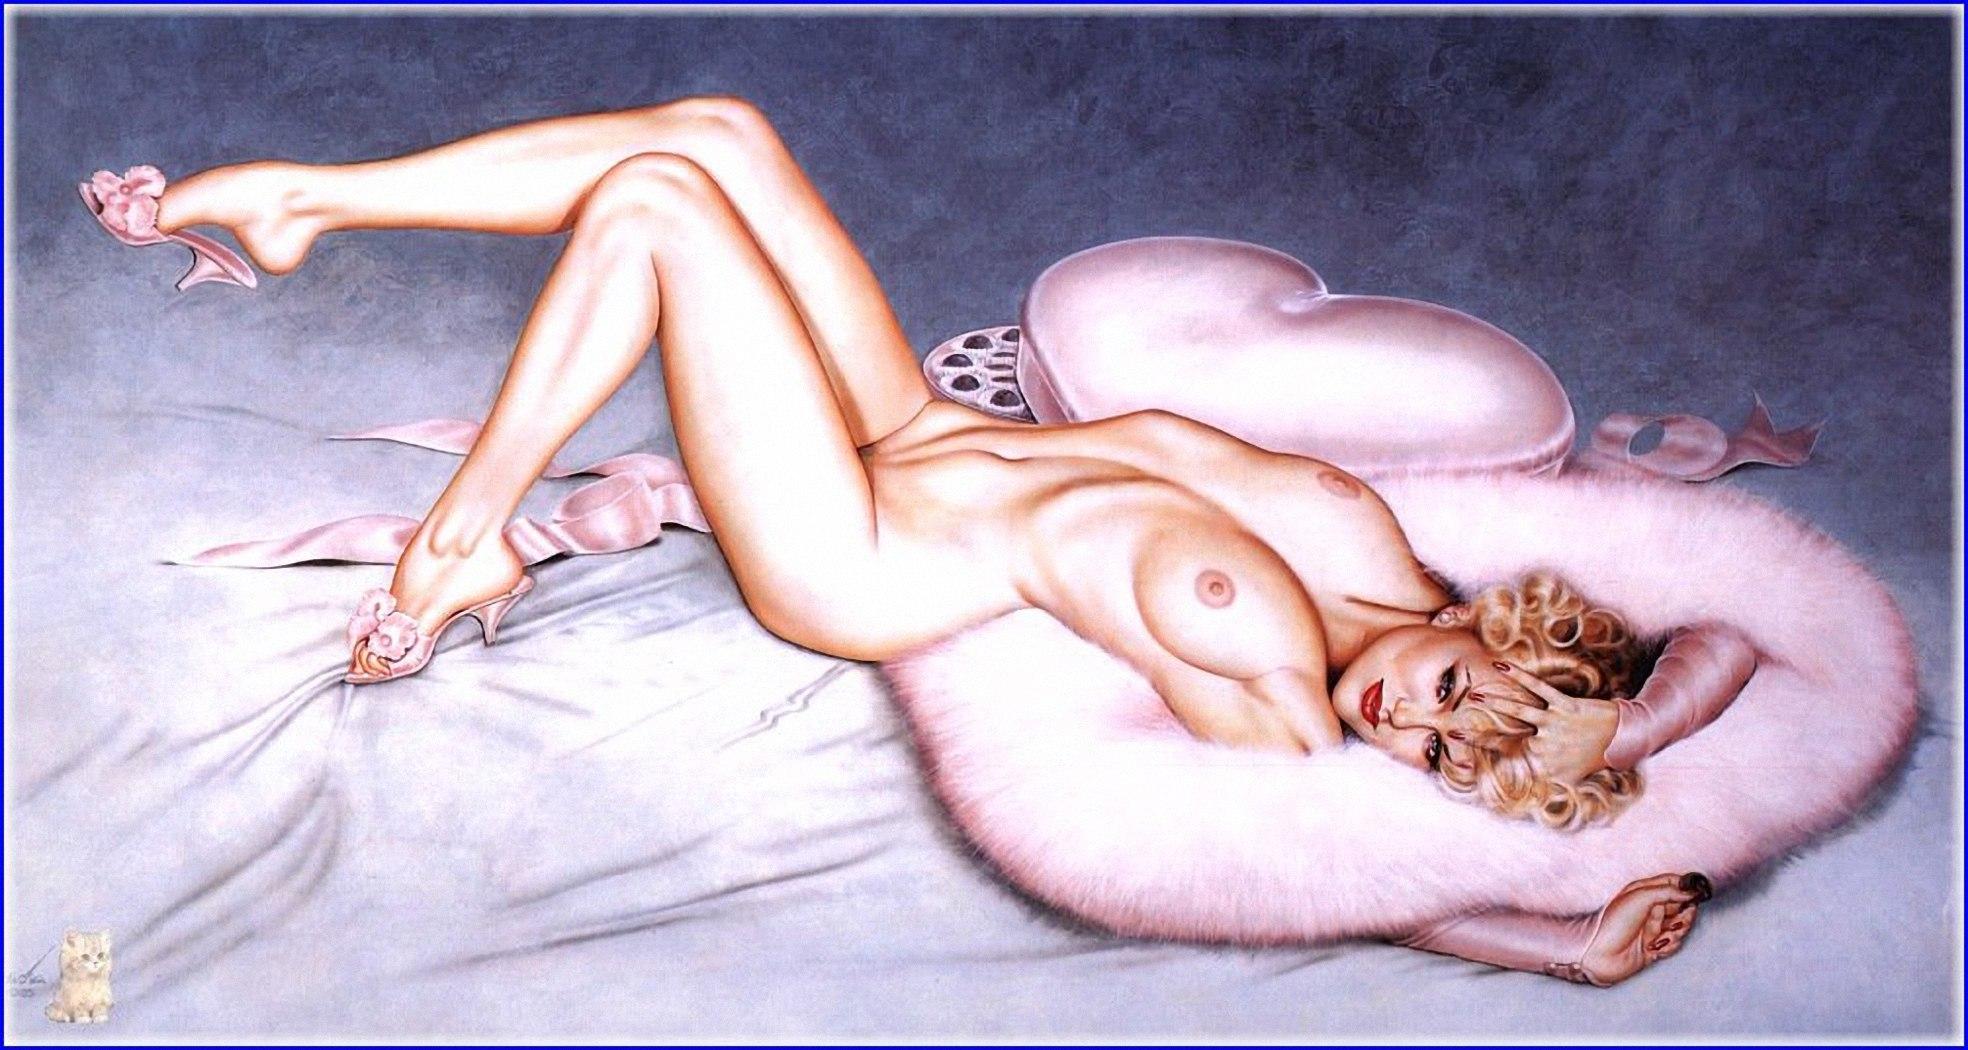 Эро рисунки девушек, Эротика рисунки Порно комиксы рисунки арт онлайн 4 фотография